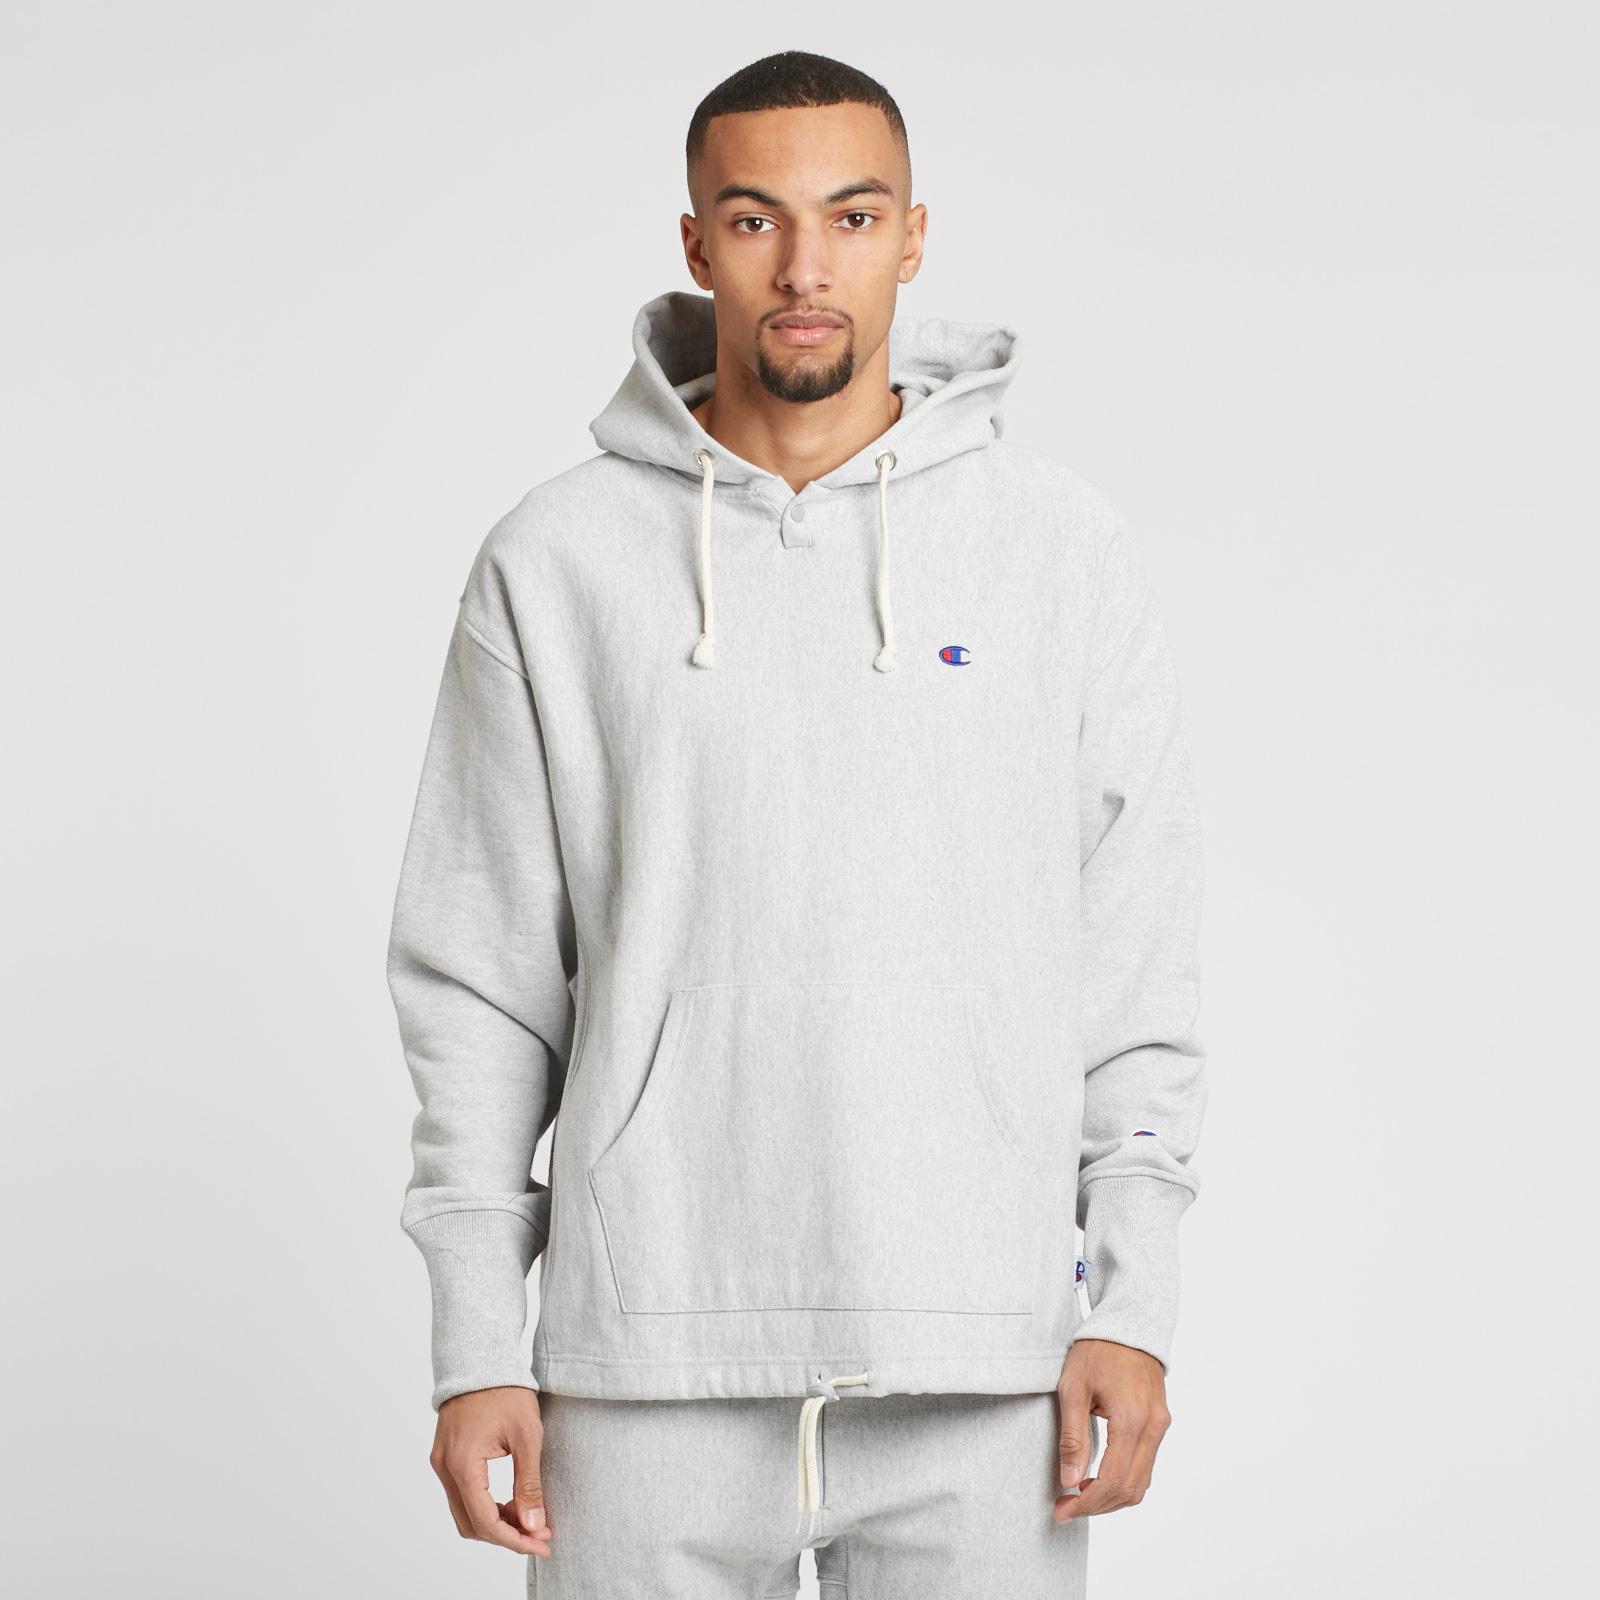 c5190a35c90a Champion Reverse Weave Hooded Sweatshirt x BEAMS - 211618-em004-gry ...